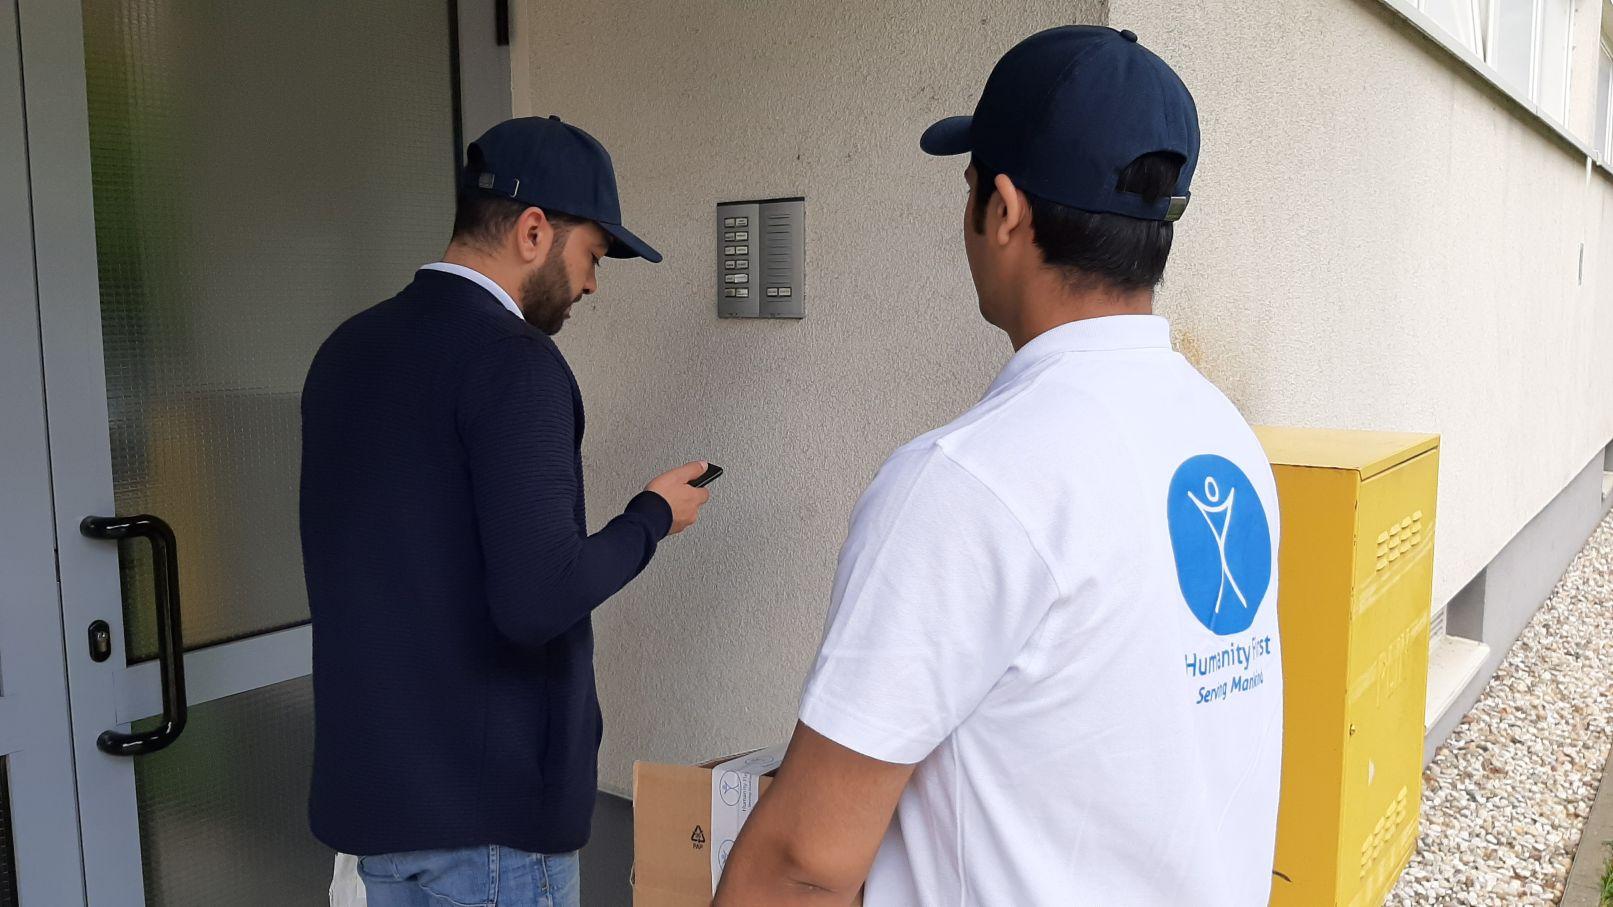 Donacija pakete hrane - Humanity First Hrvatska